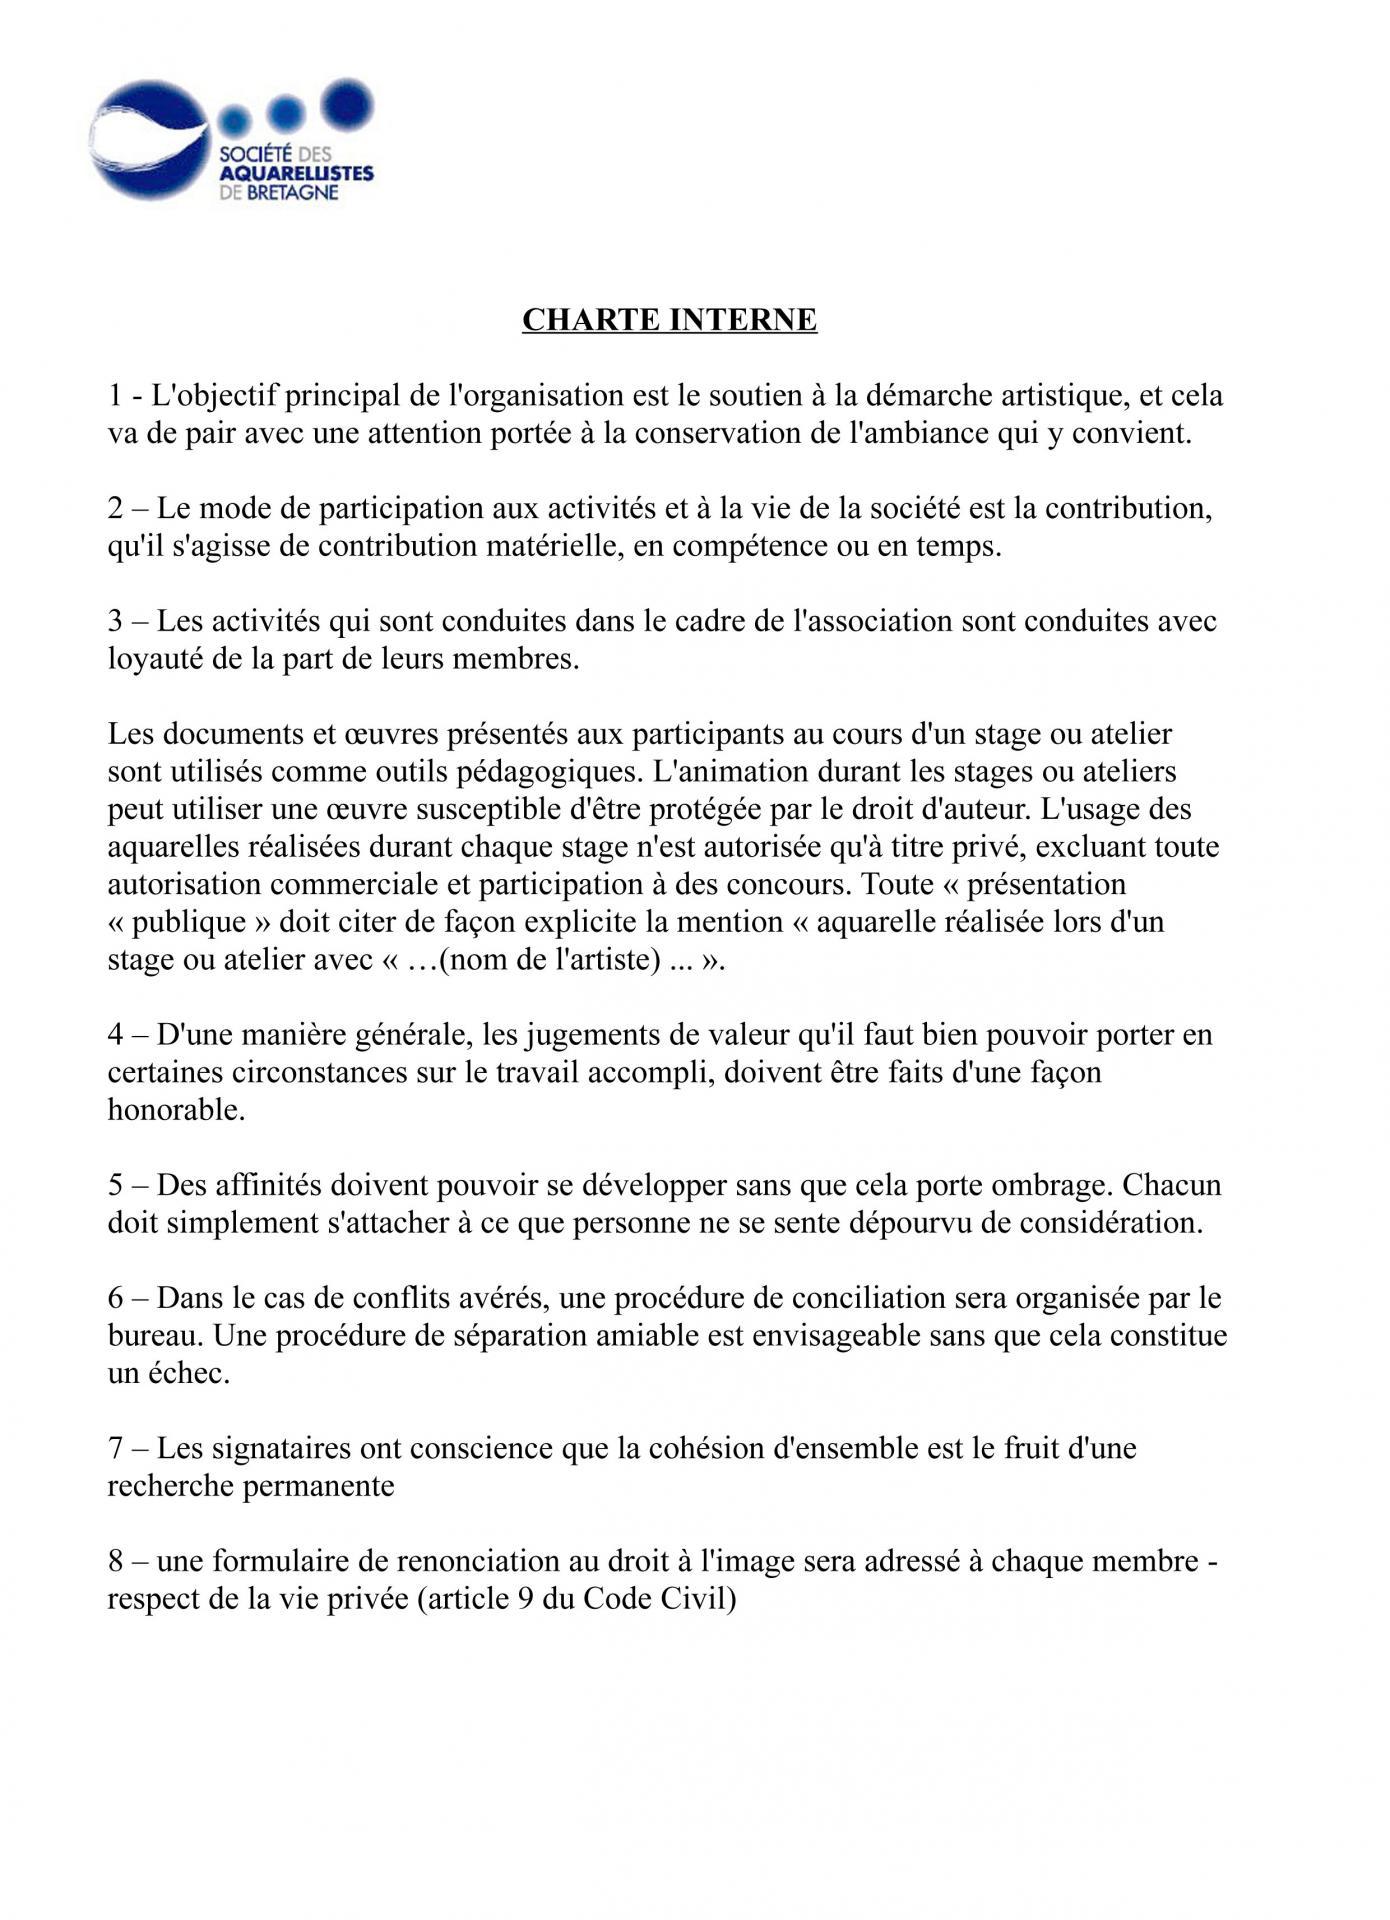 Charte interne 2